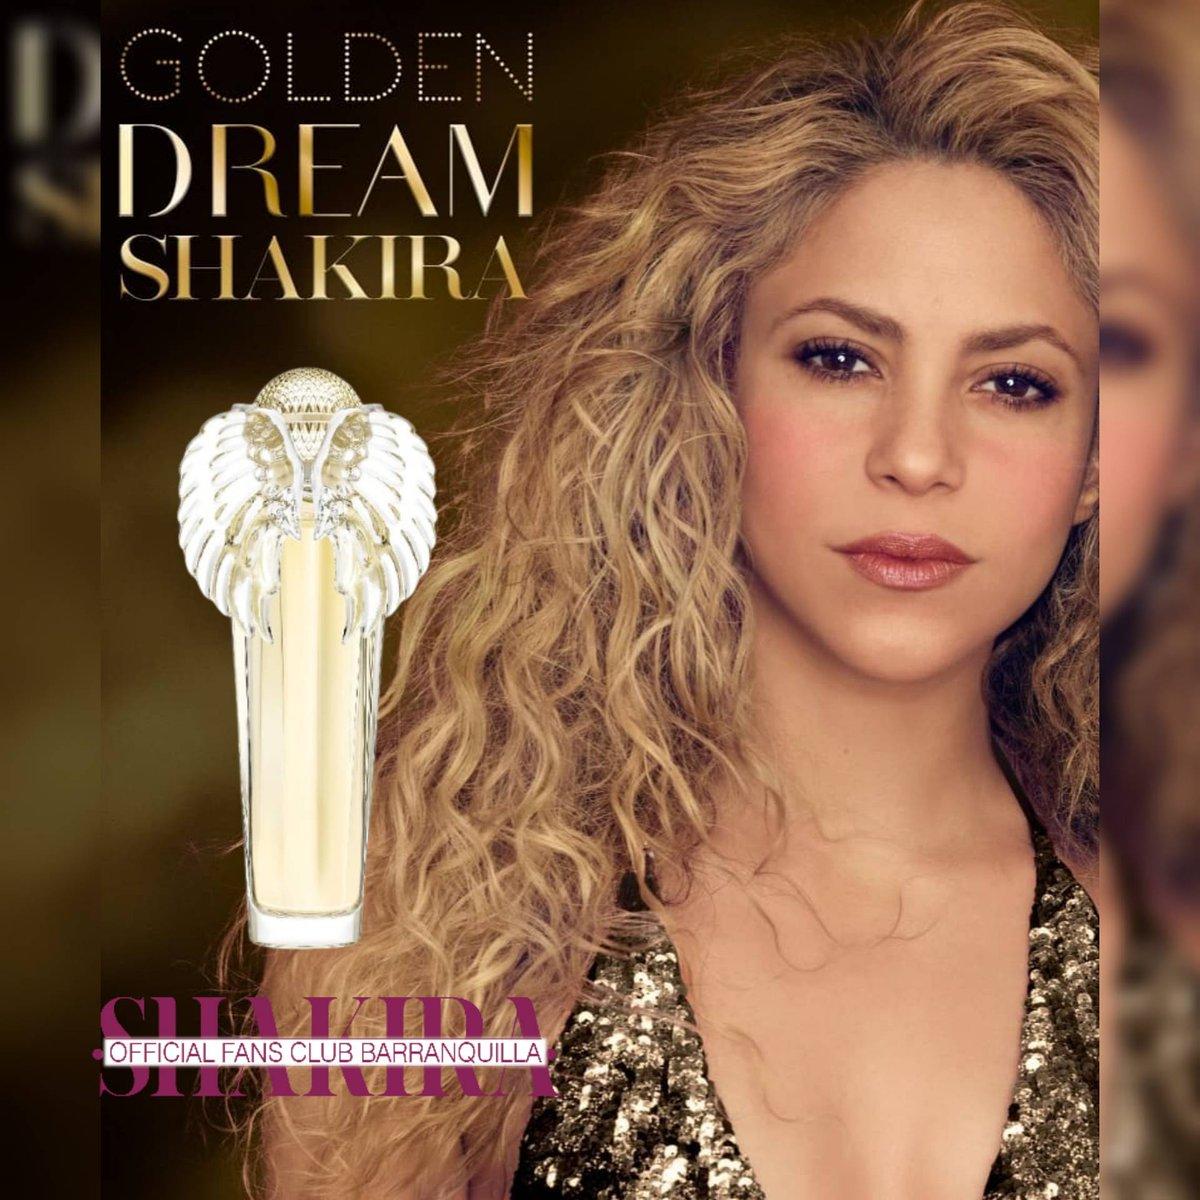 .@Shakira nos regala su última fragancia para cerrar este 2020, #GoldenDream by #Shakira 🤩 #ShakiraPerfumes 🎁